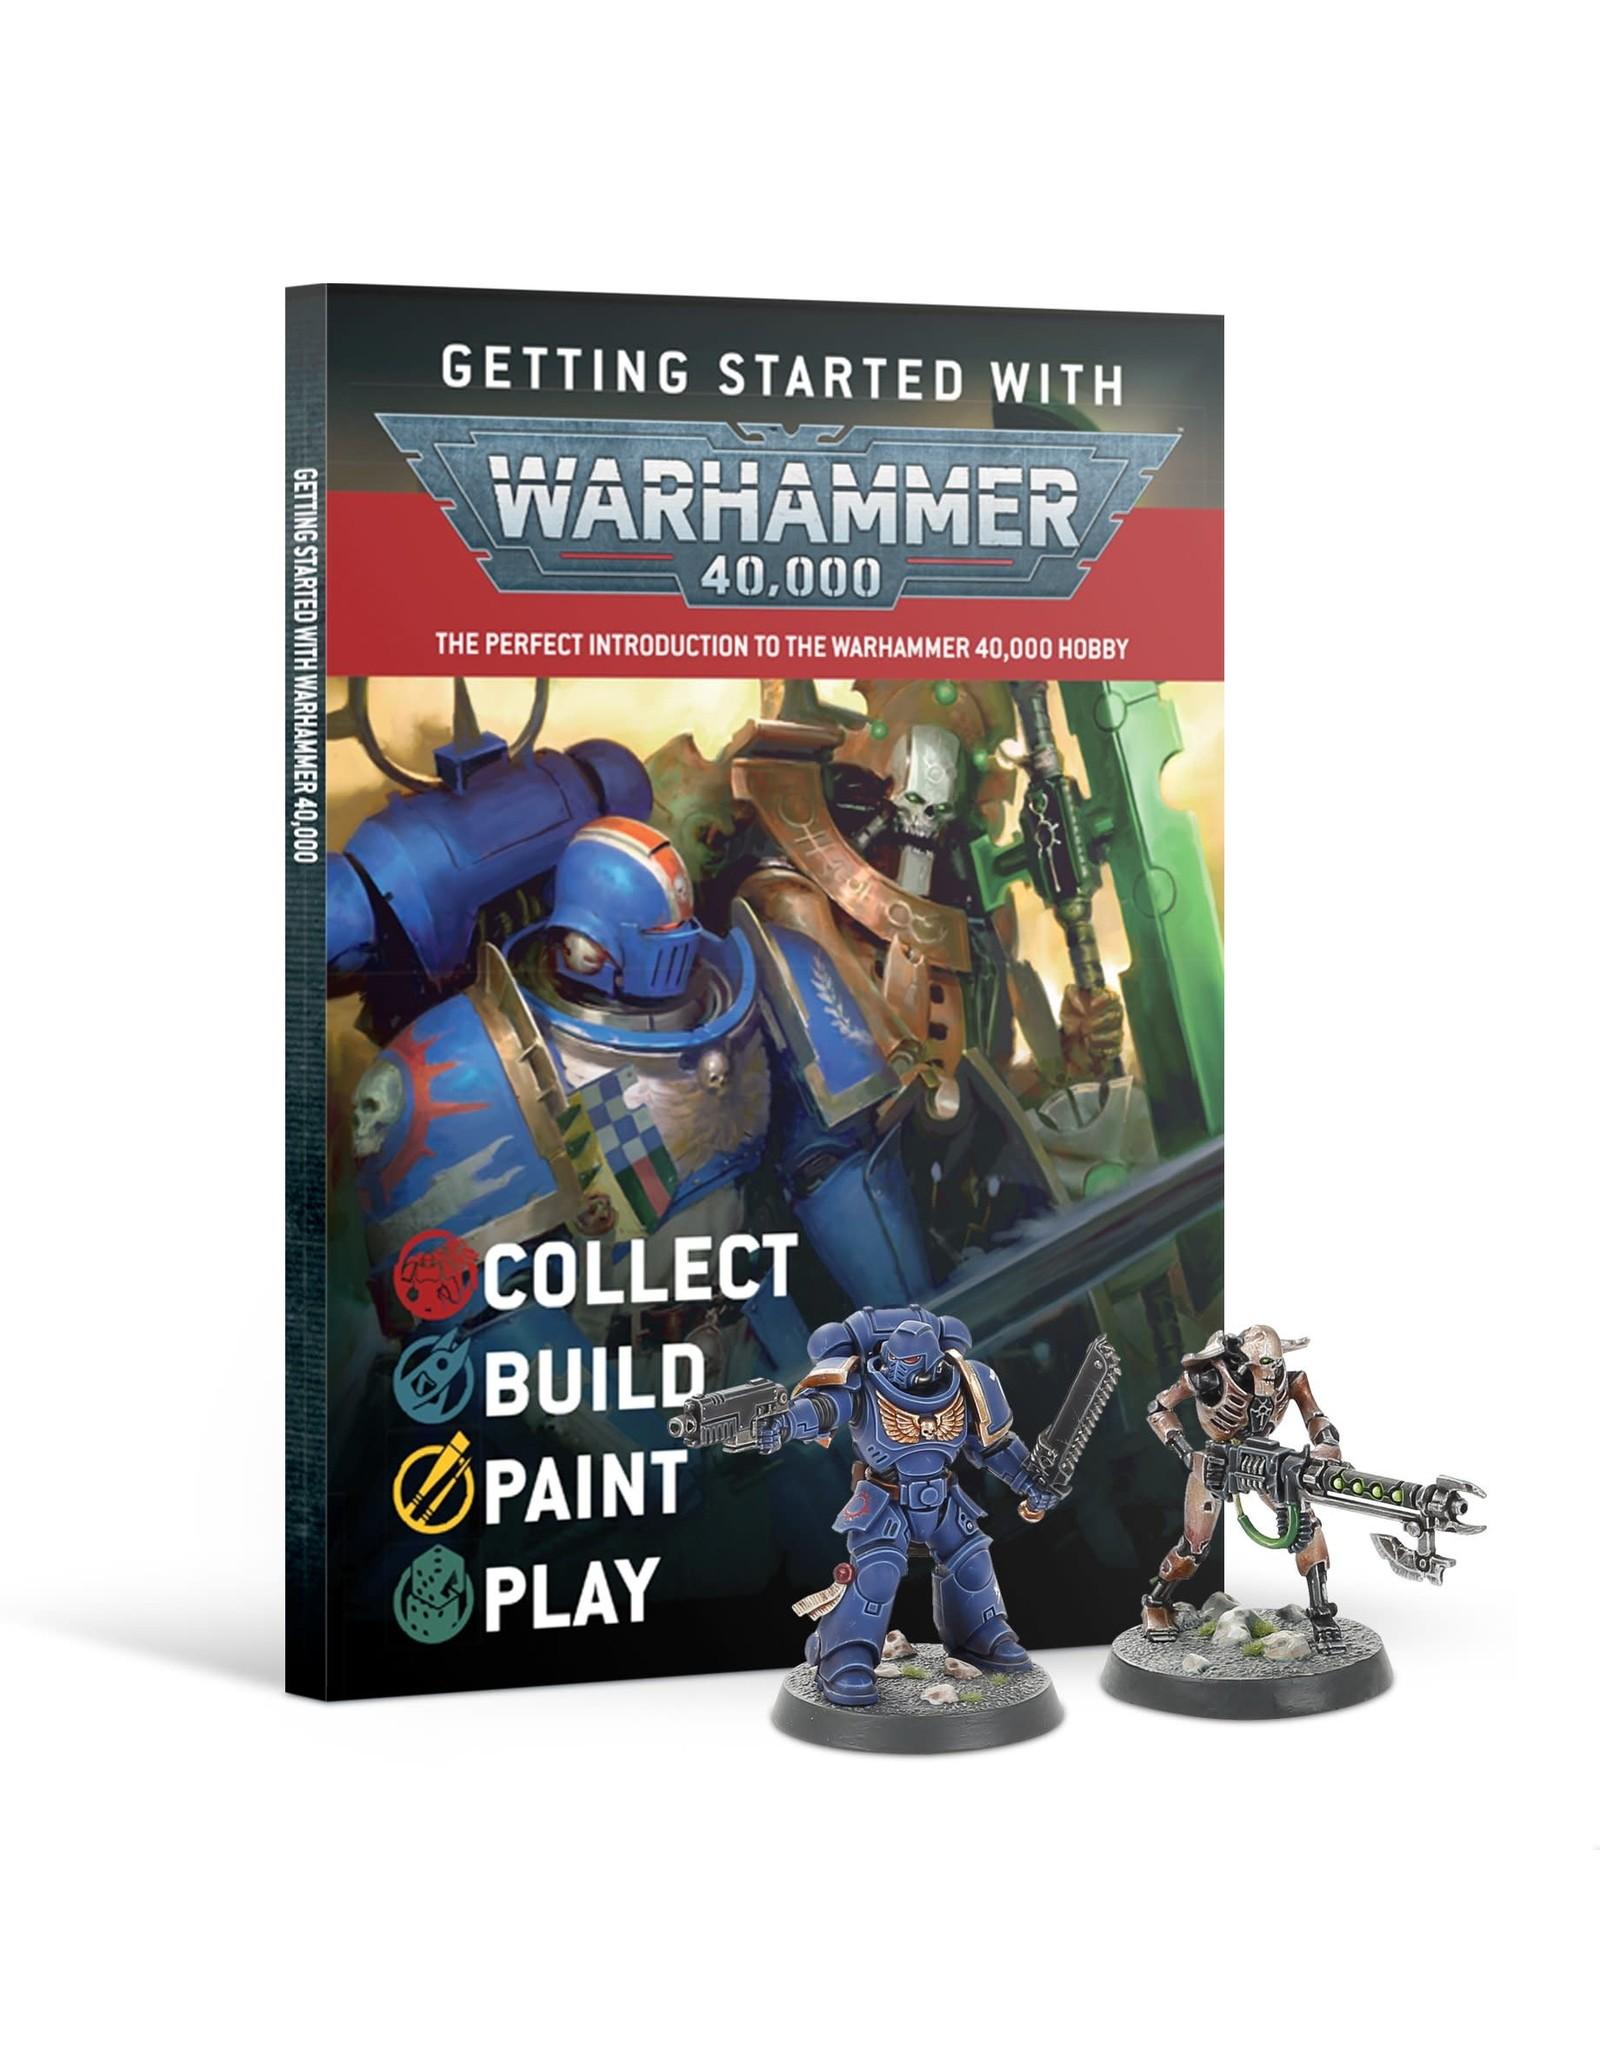 Warhammer 40k GETTING STARTED WITH WARHAMMER 40K (ENG)